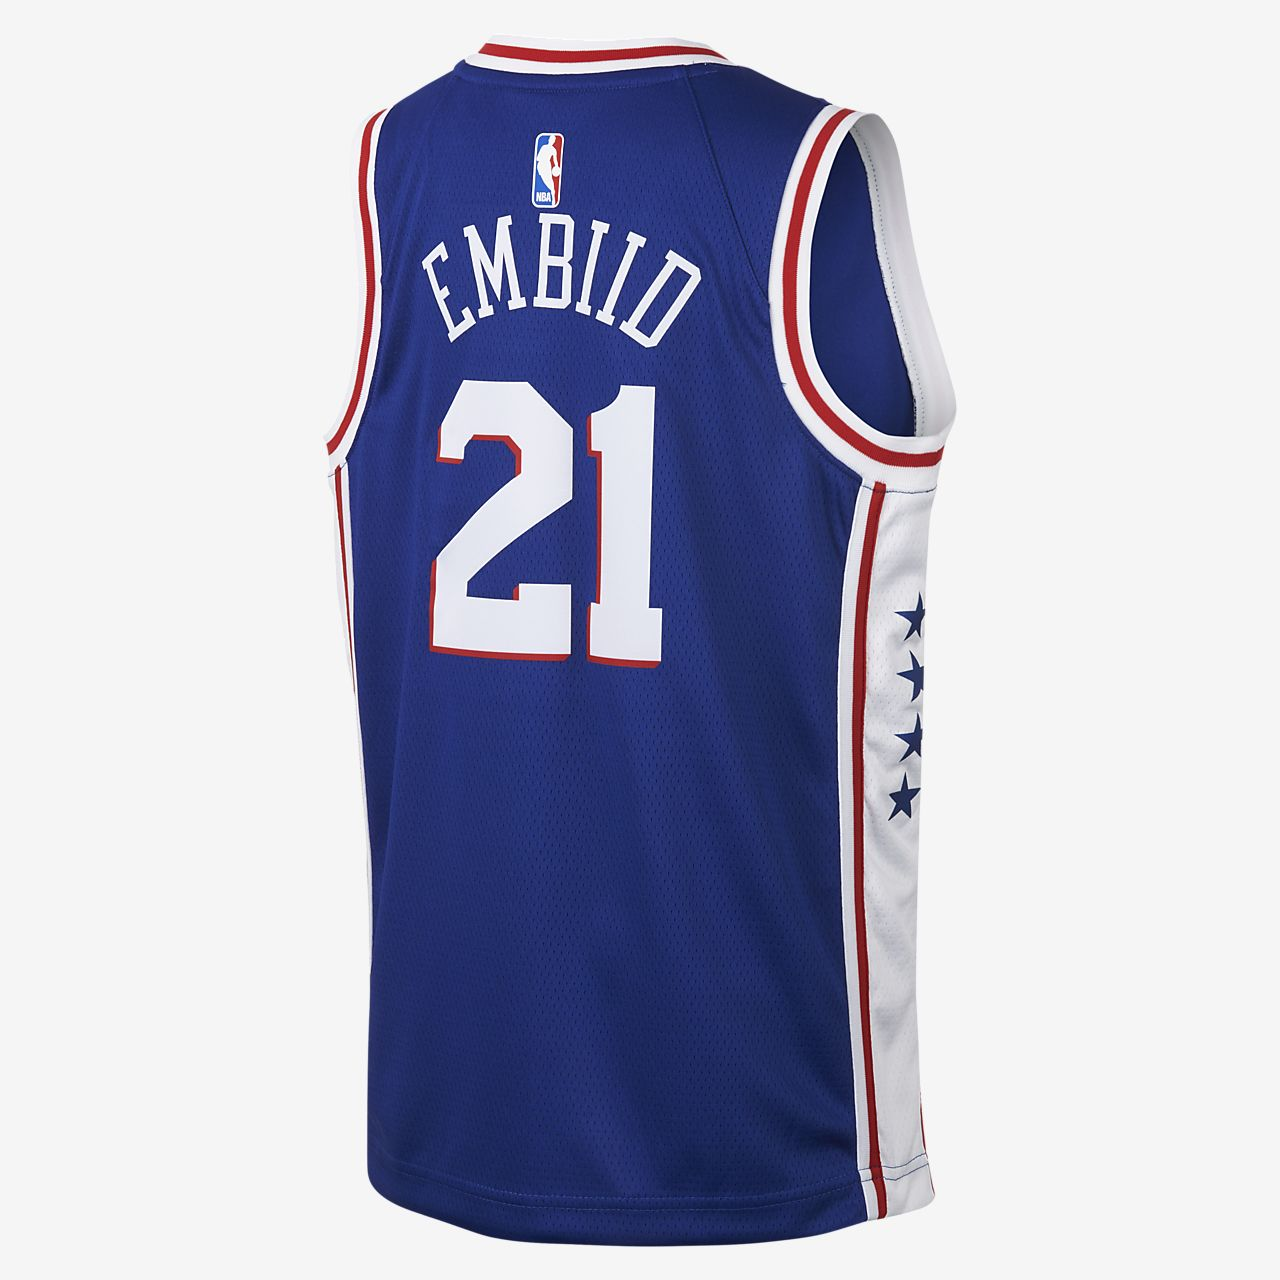 0638966311d3 ... Joel Embiid Philadelphia 76ers Nike Icon Edition Swingman Big Kids  NBA  Jersey